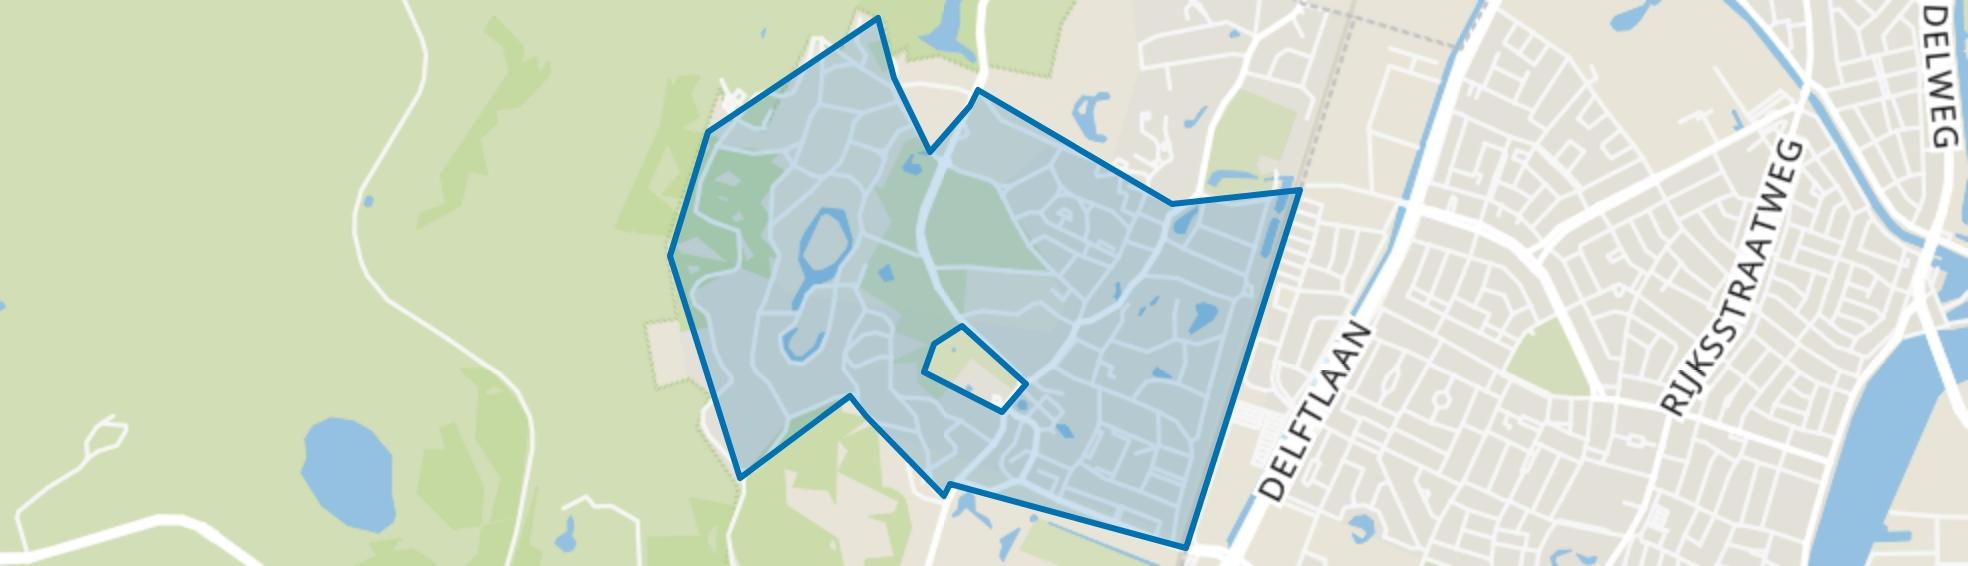 Bloemendaal, Bloemendaal map